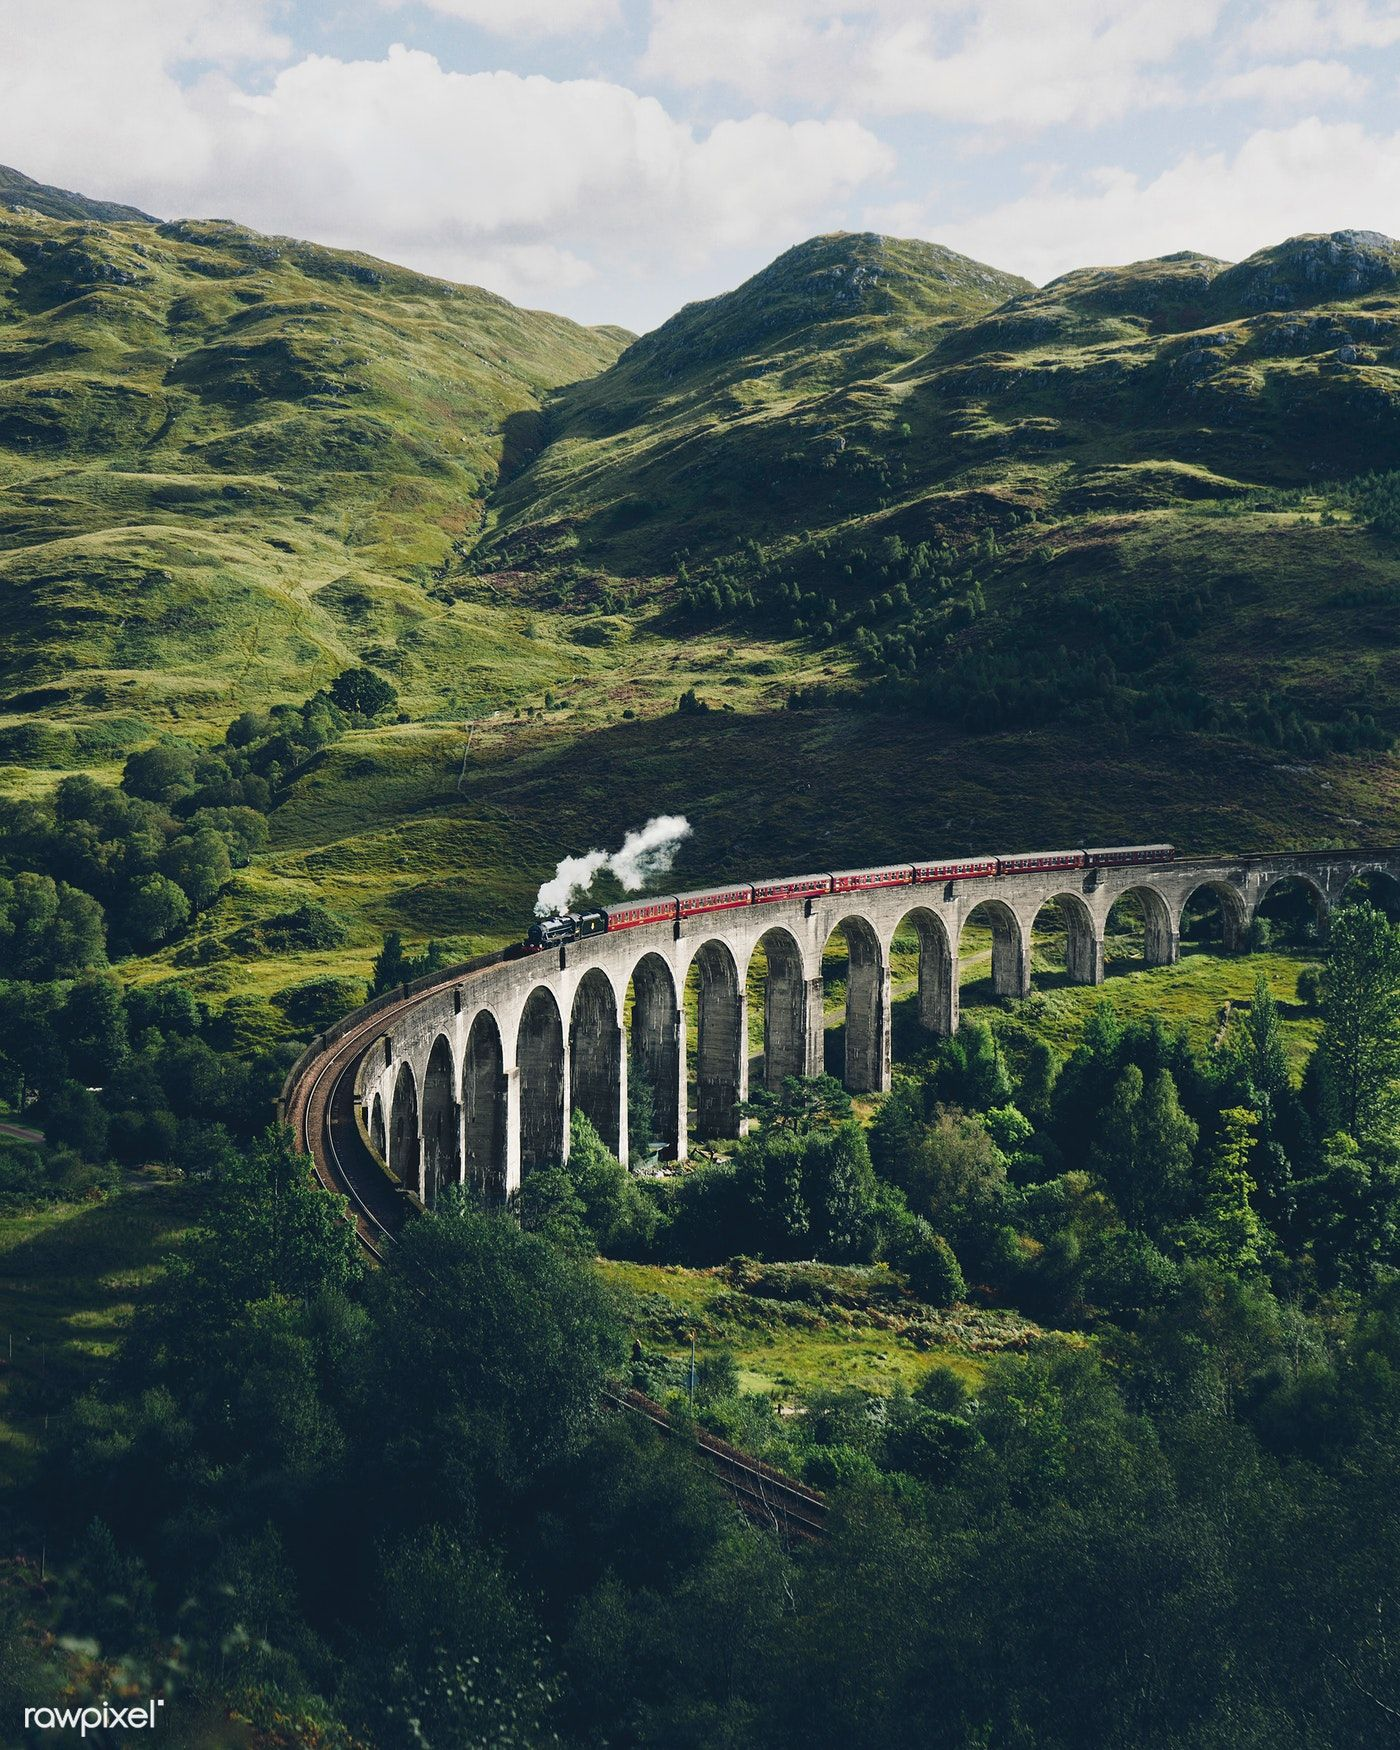 Download Premium Image Of Glenfinnan Viaduct Railway In Inverness Shire Scotland Wallpaper Harry Potter Wallpaper Inverness Shire